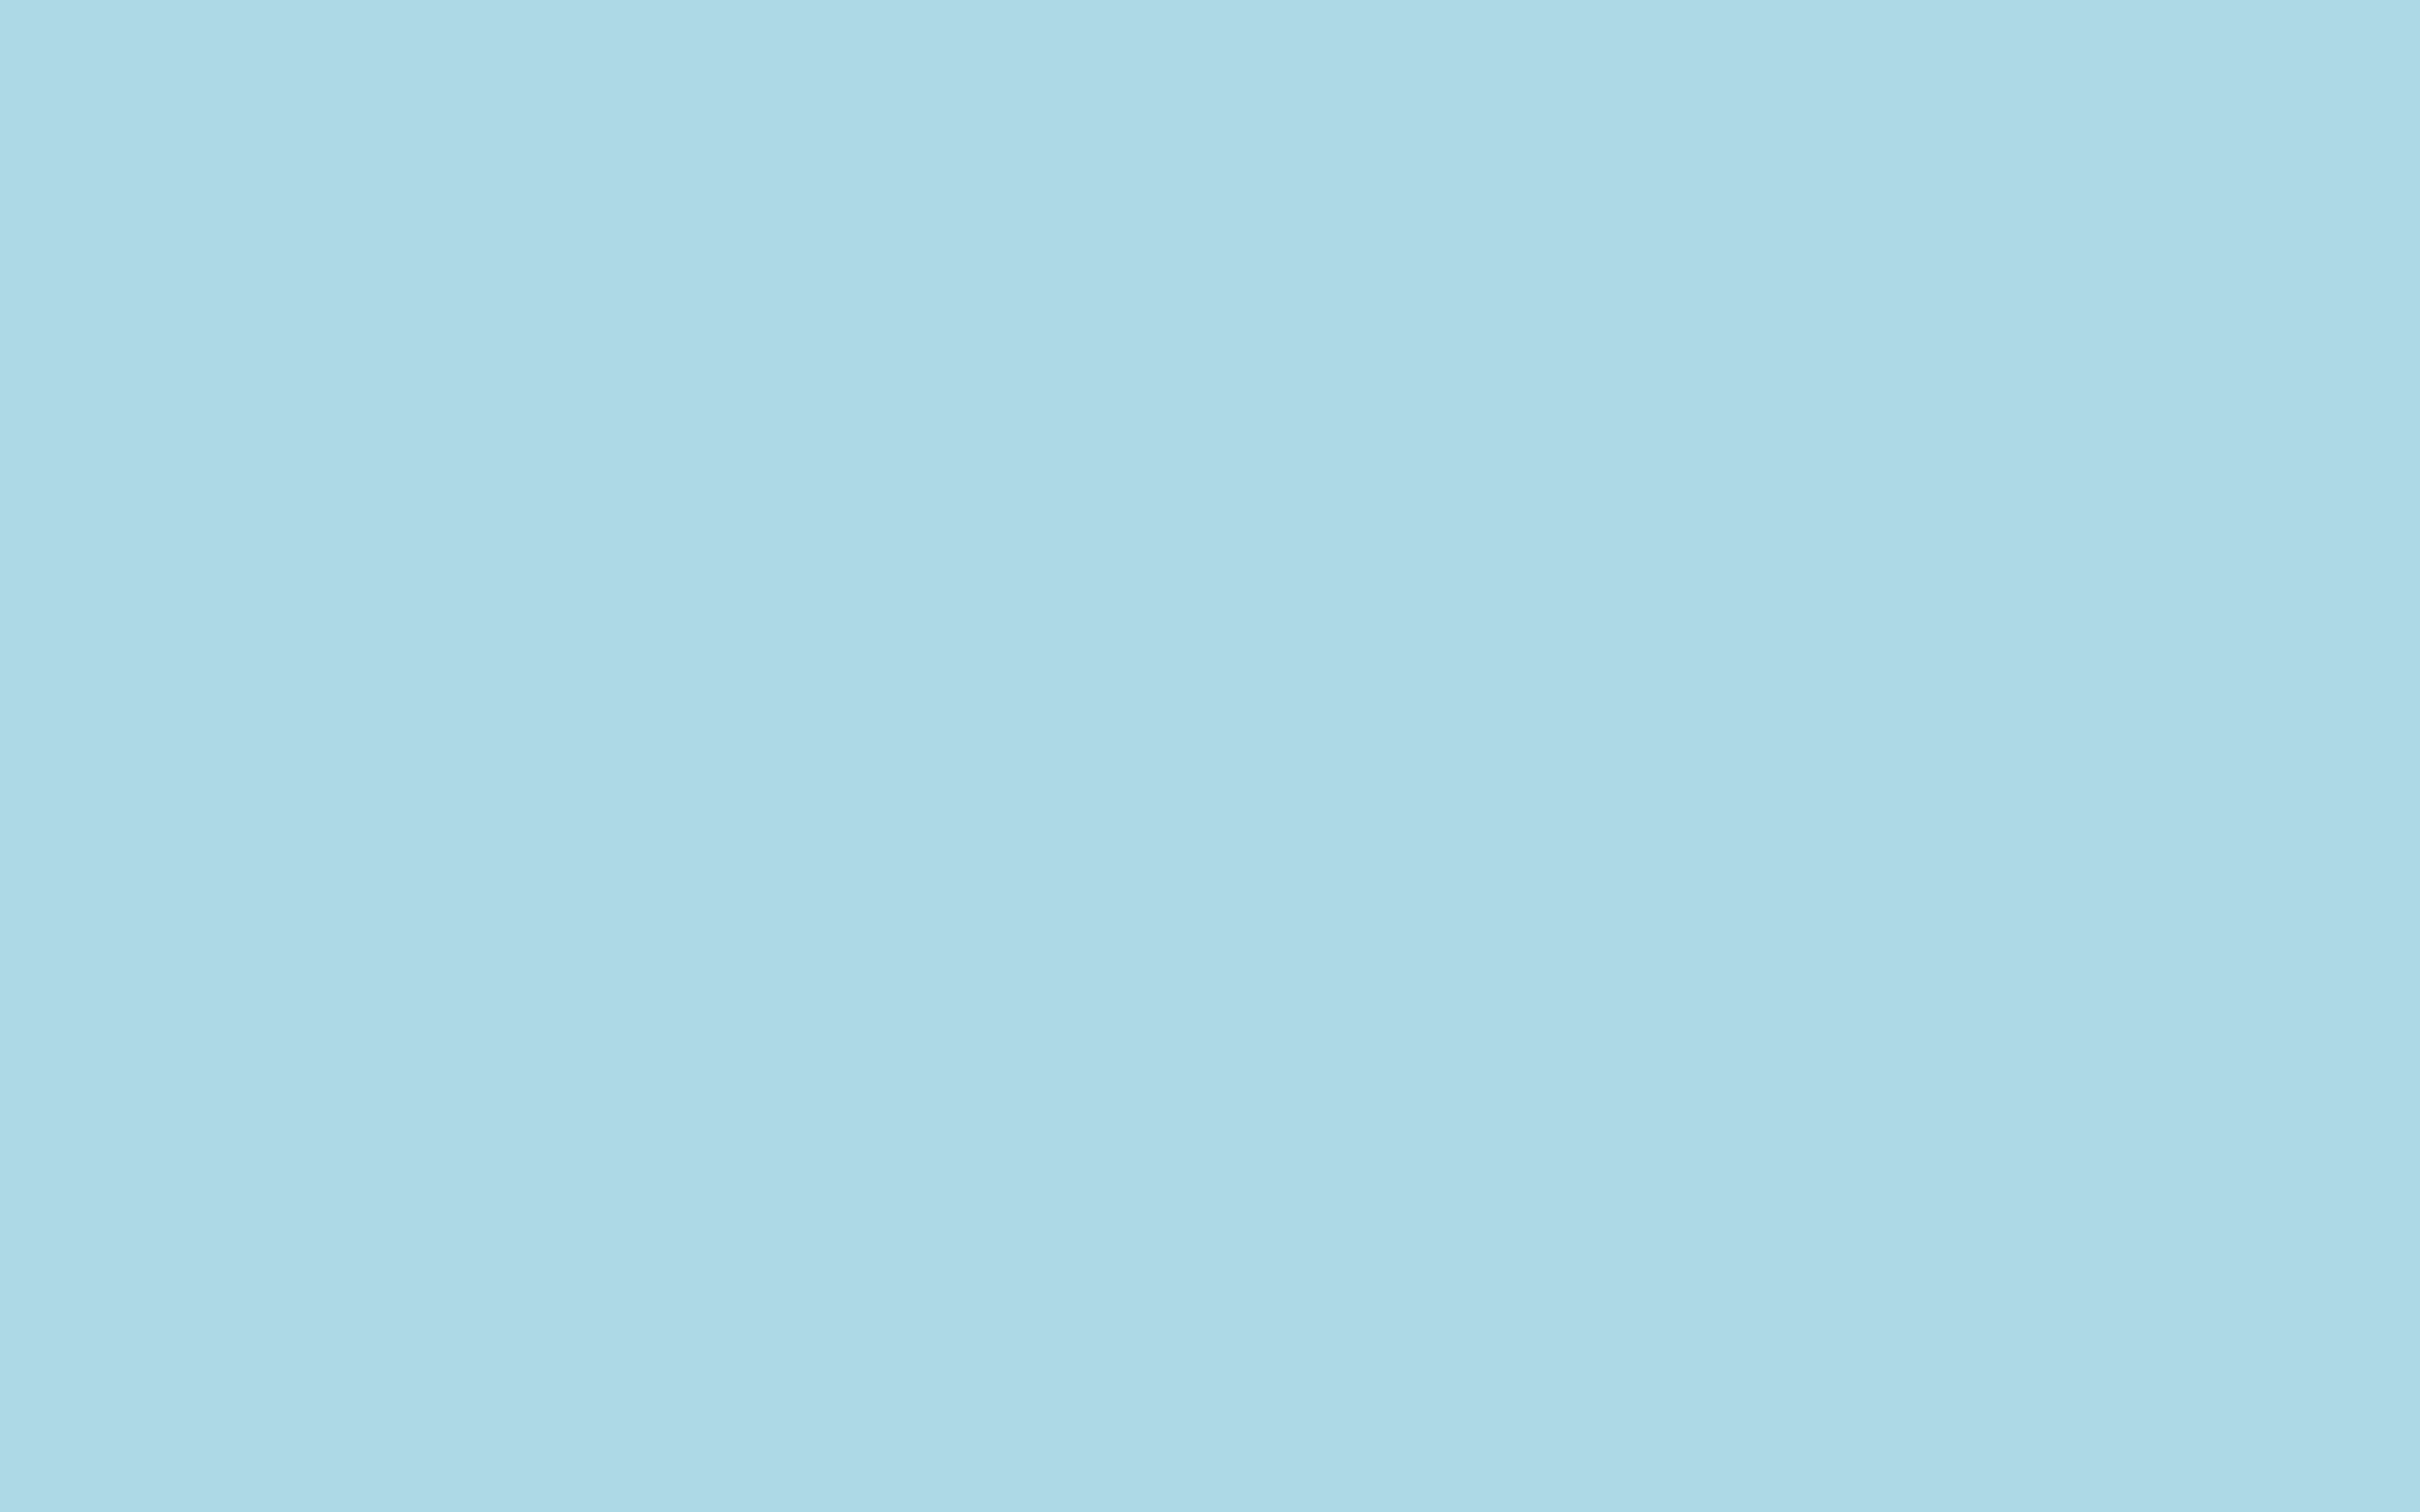 Light Blue Solid Color Wallpaper 2114